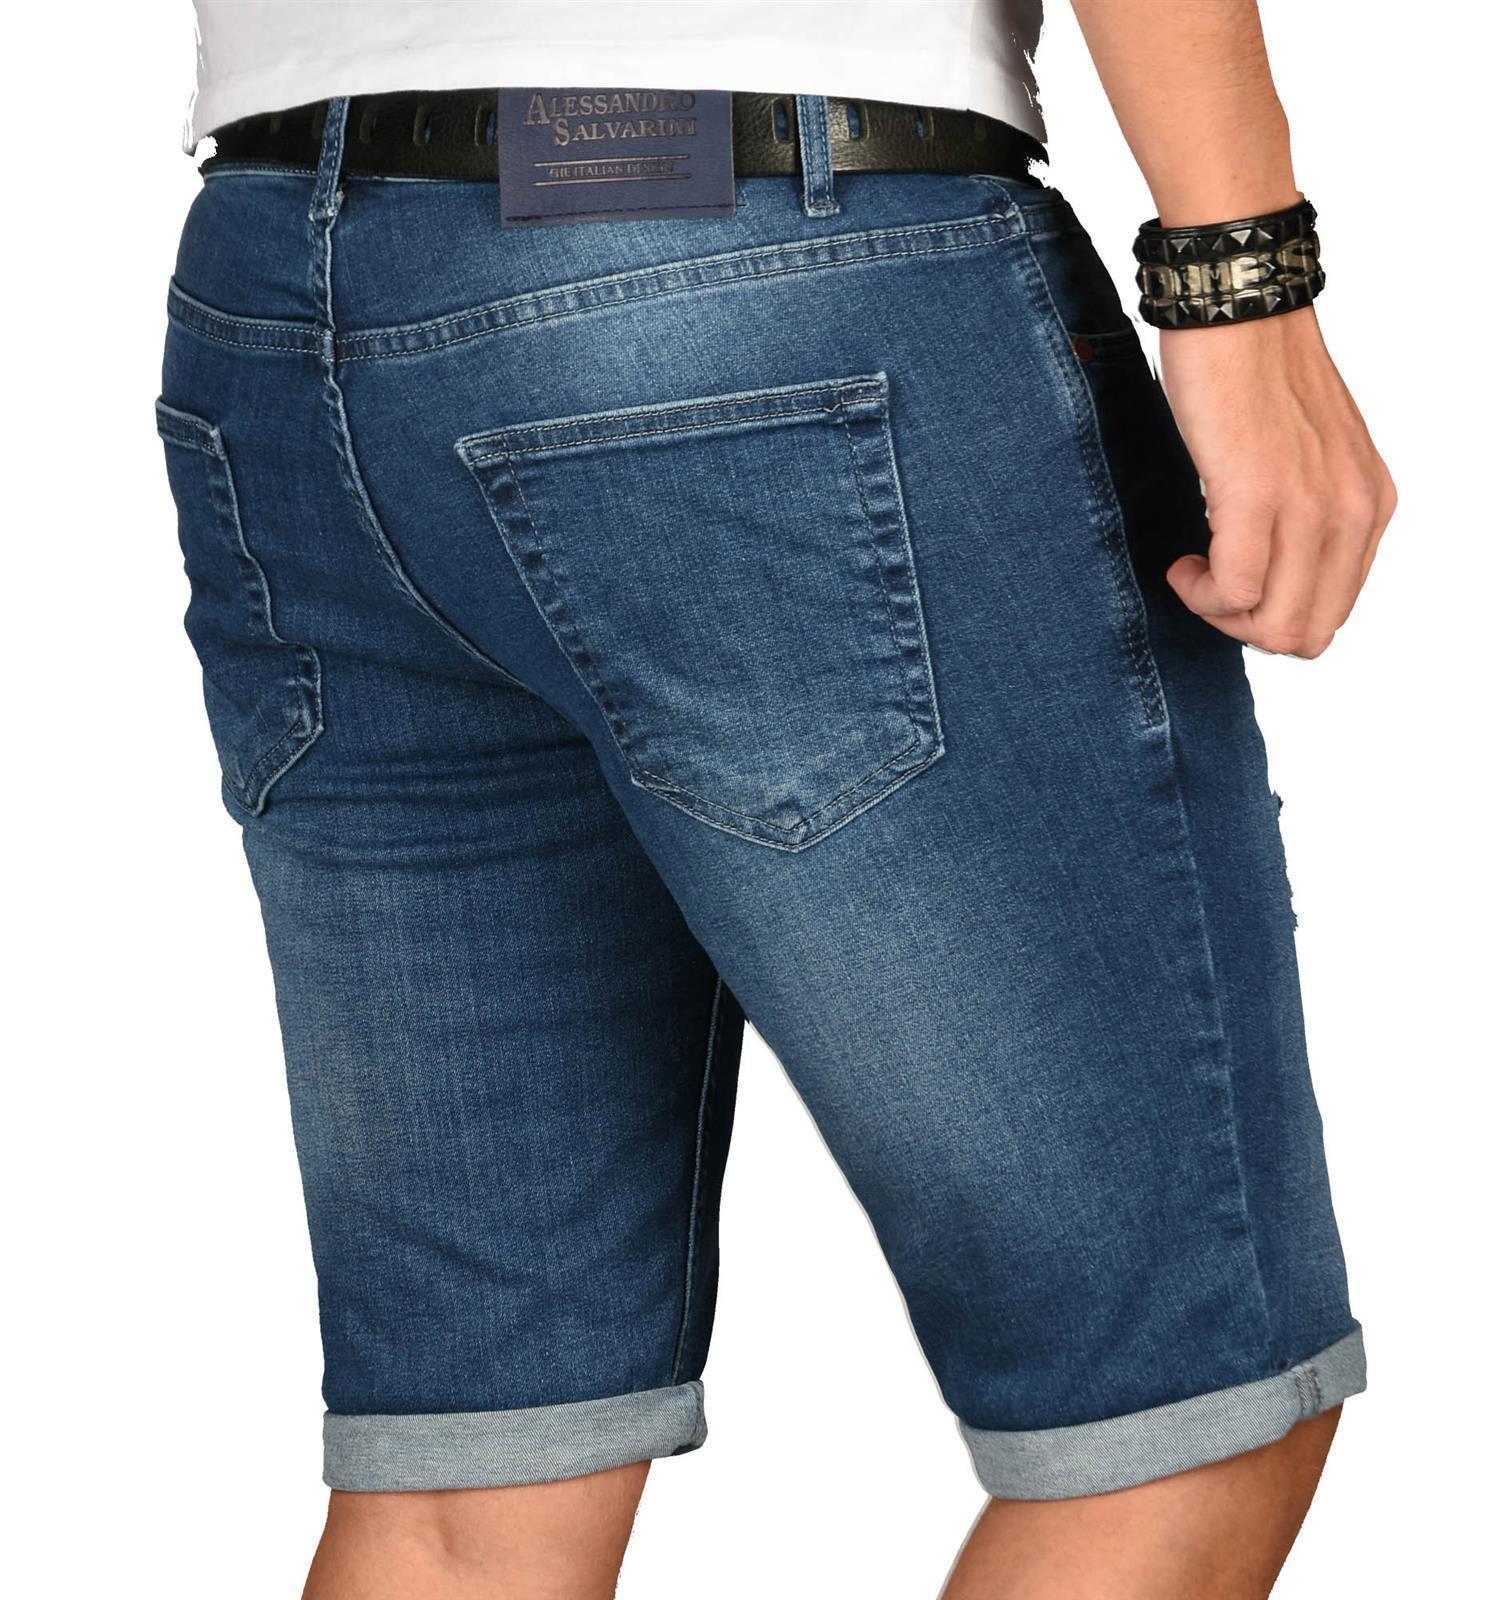 A-Salvarini-Herren-Designer-Jeans-Short-kurze-Hose-Slim-Sommer-Shorts-Washed Indexbild 32